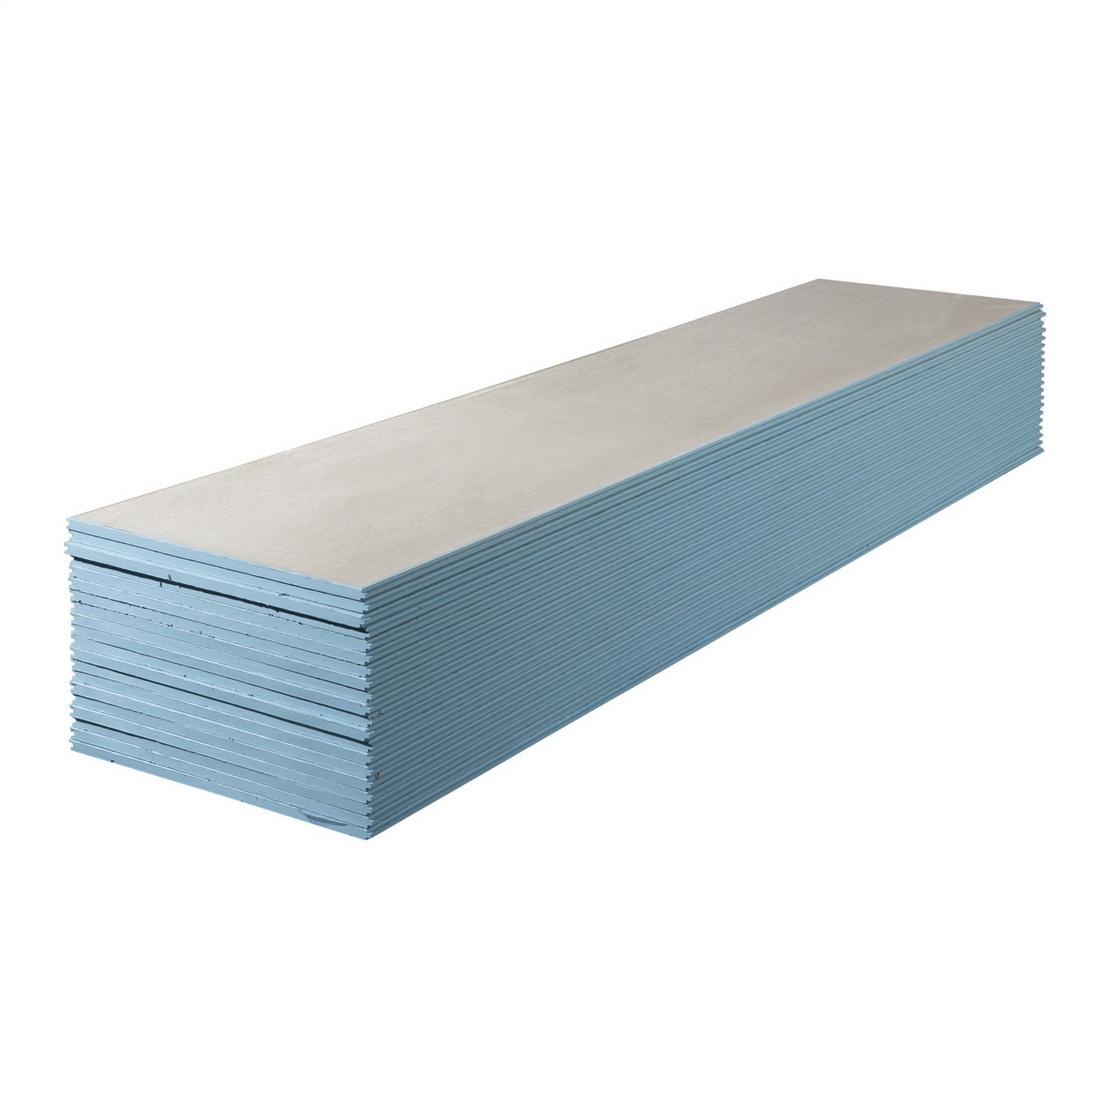 Secura Exterior Flooring 19mm 2700 x 600mm